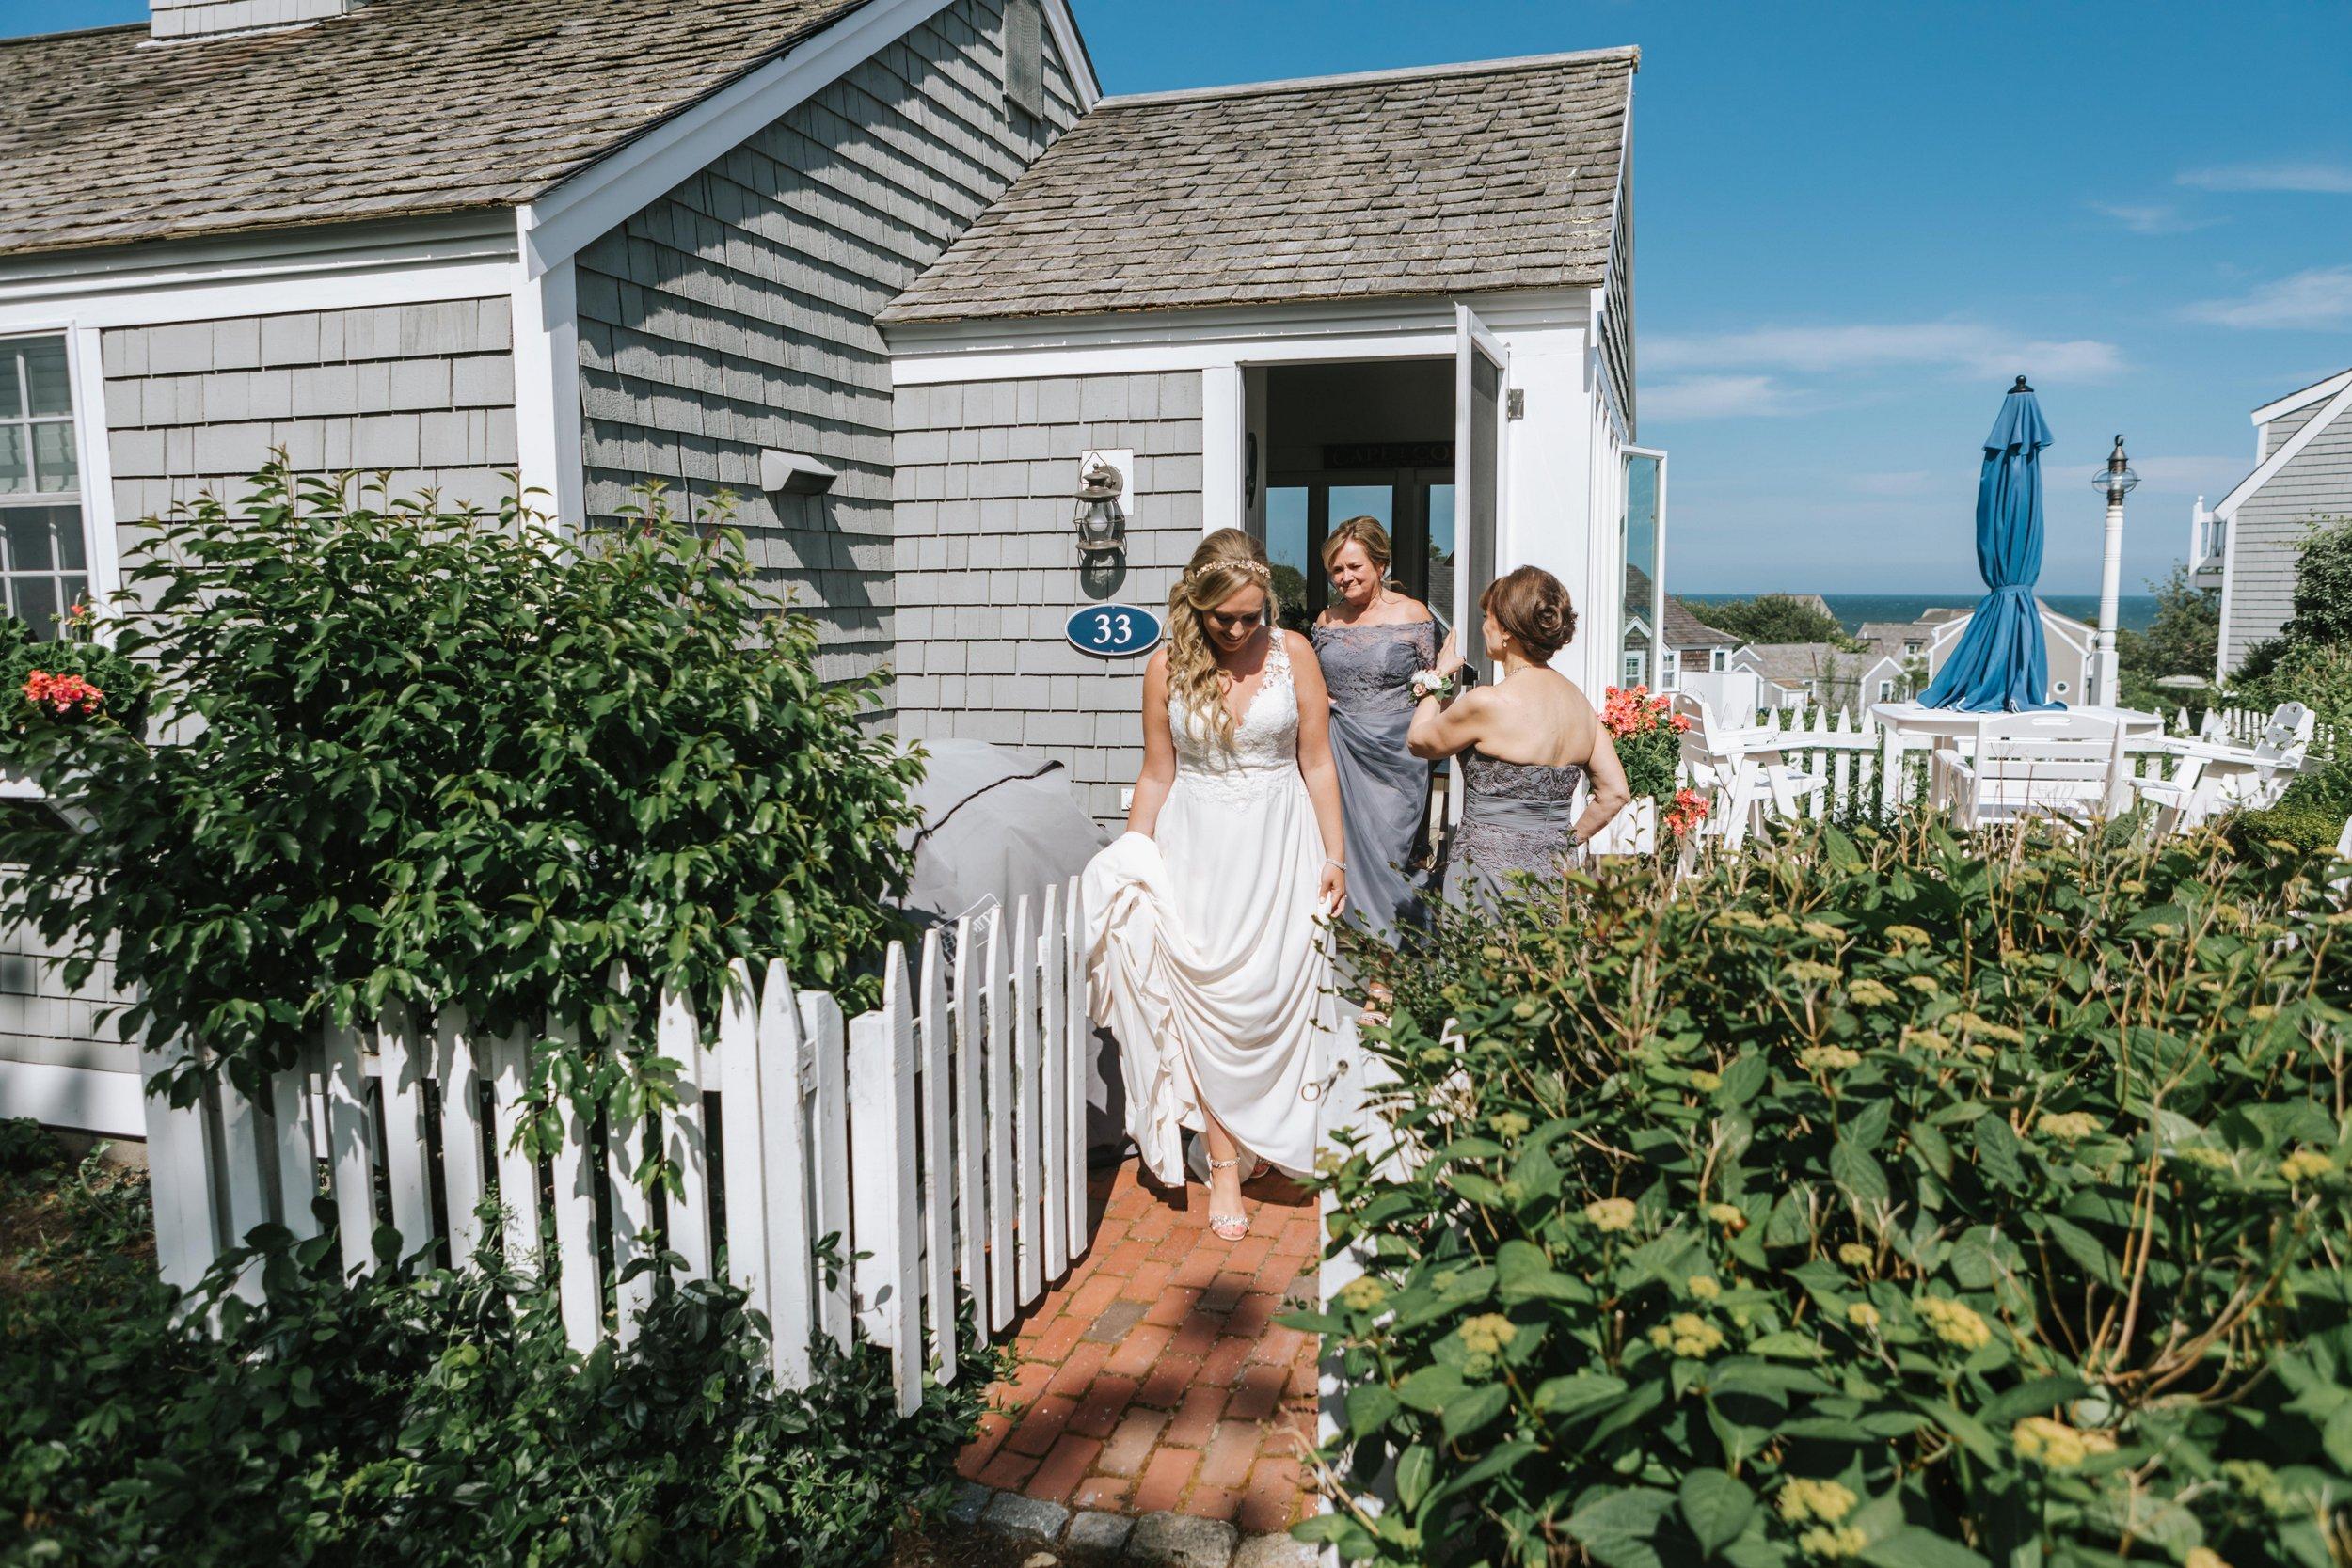 Popponesset-Inn-Wedding-Cape-Cod-Lena-Mirisola-Photography-10.jpg